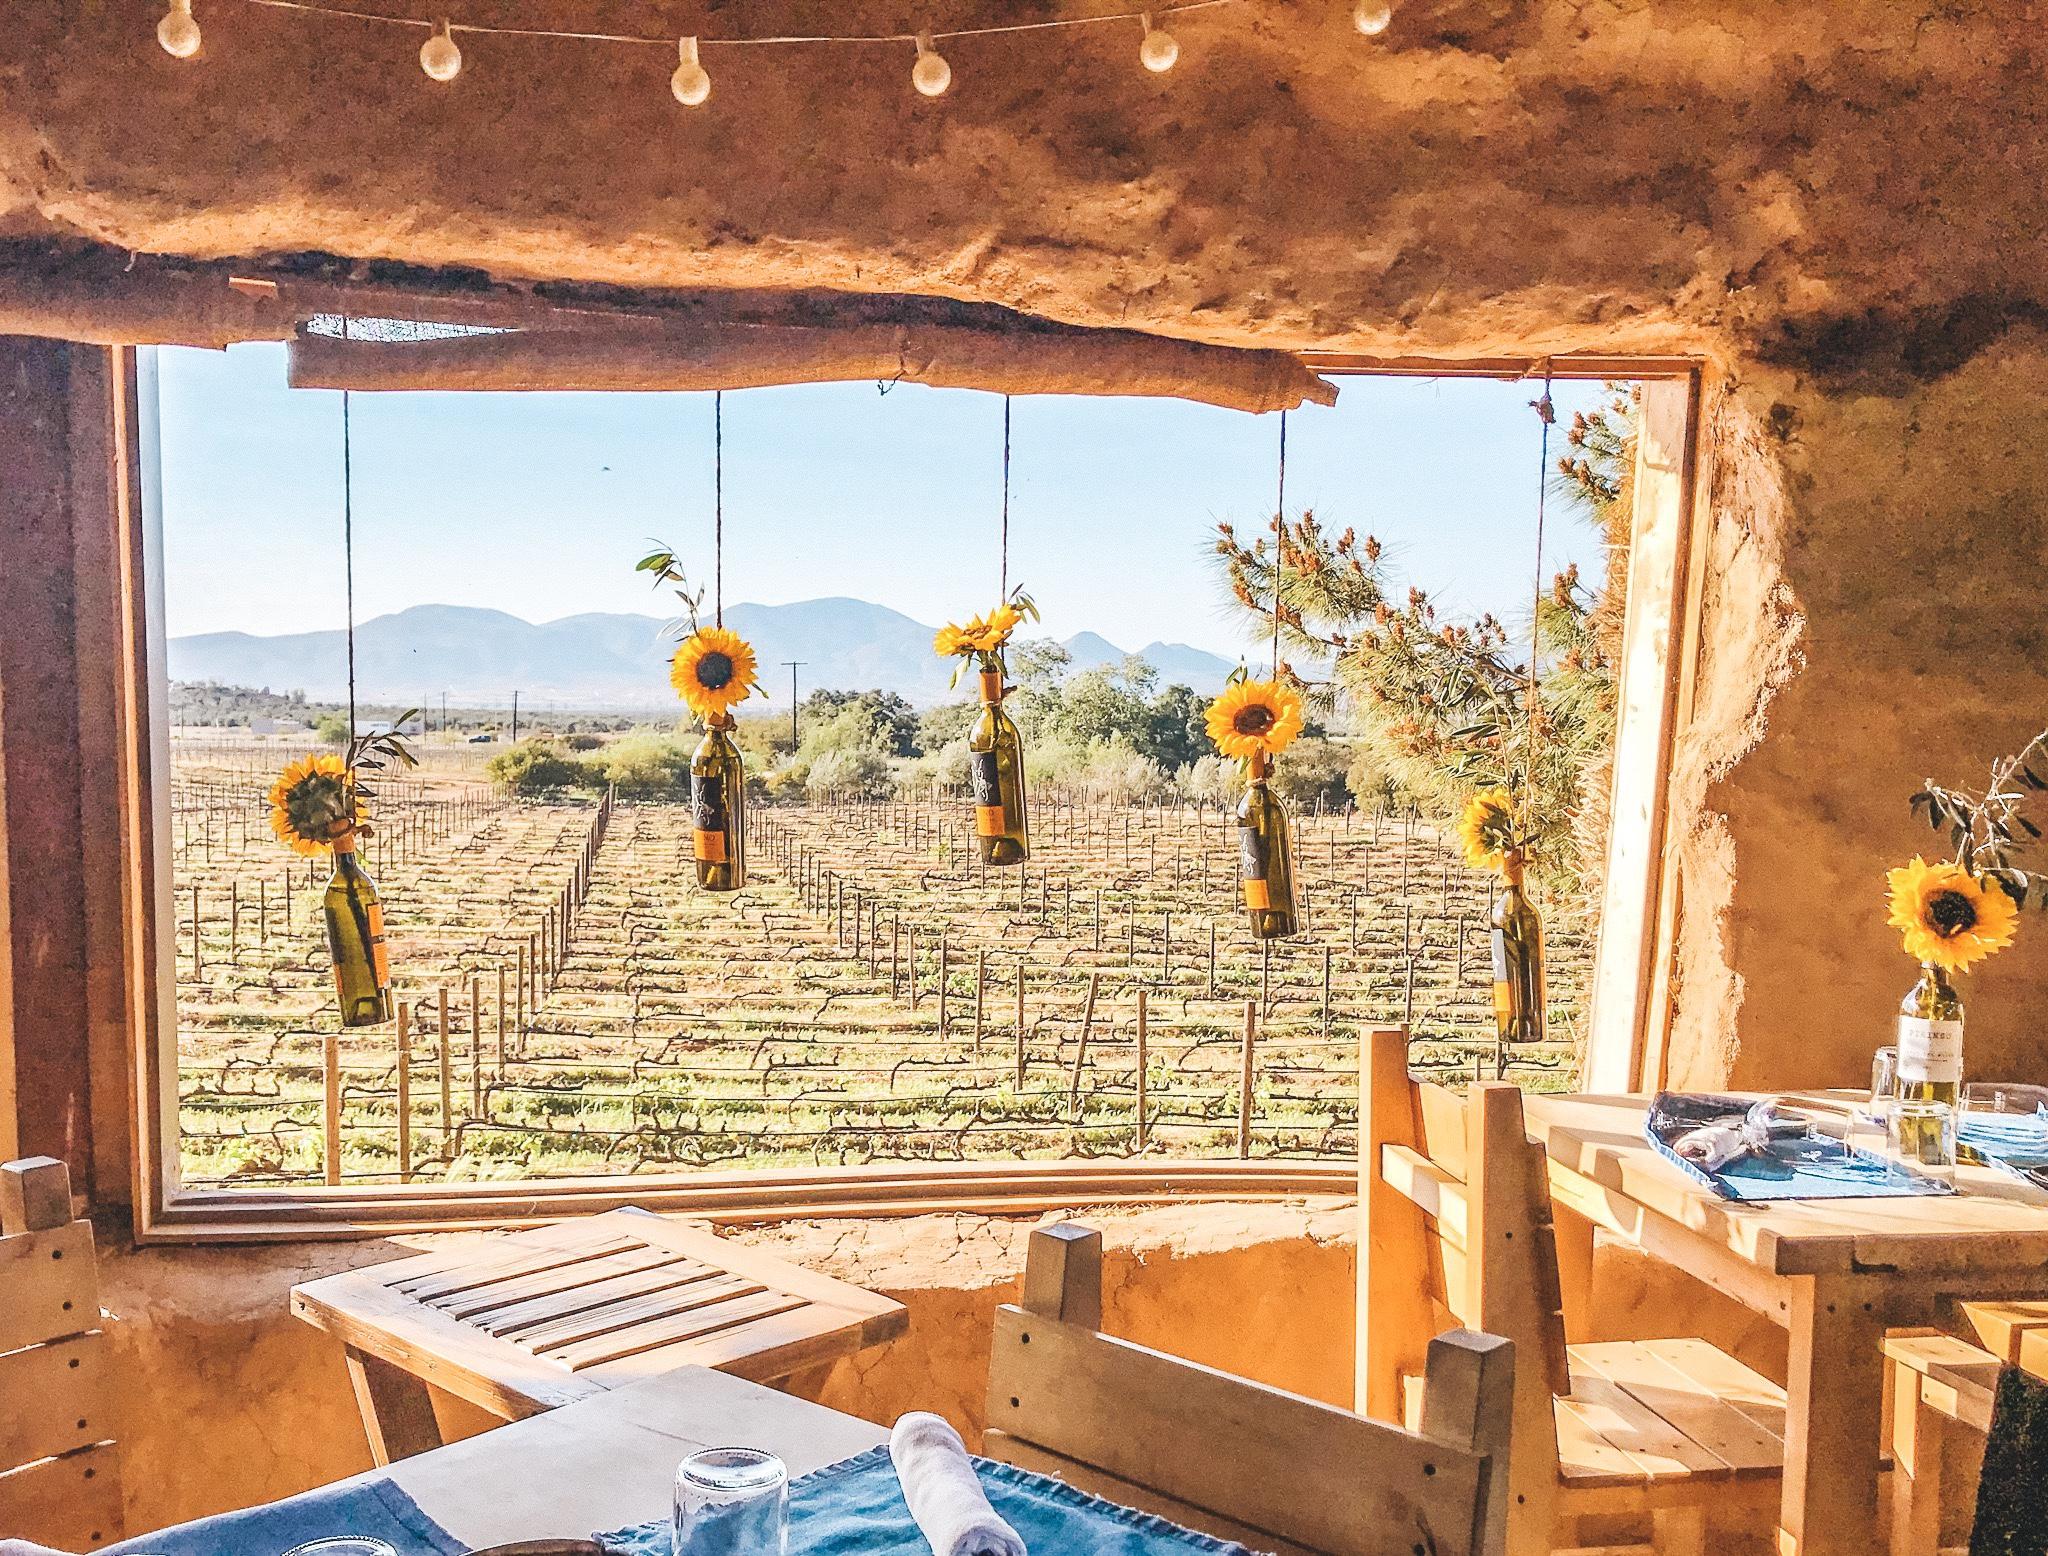 Deckman's El Mogor | Valle de Guadalupe | Photo by Erika Beach